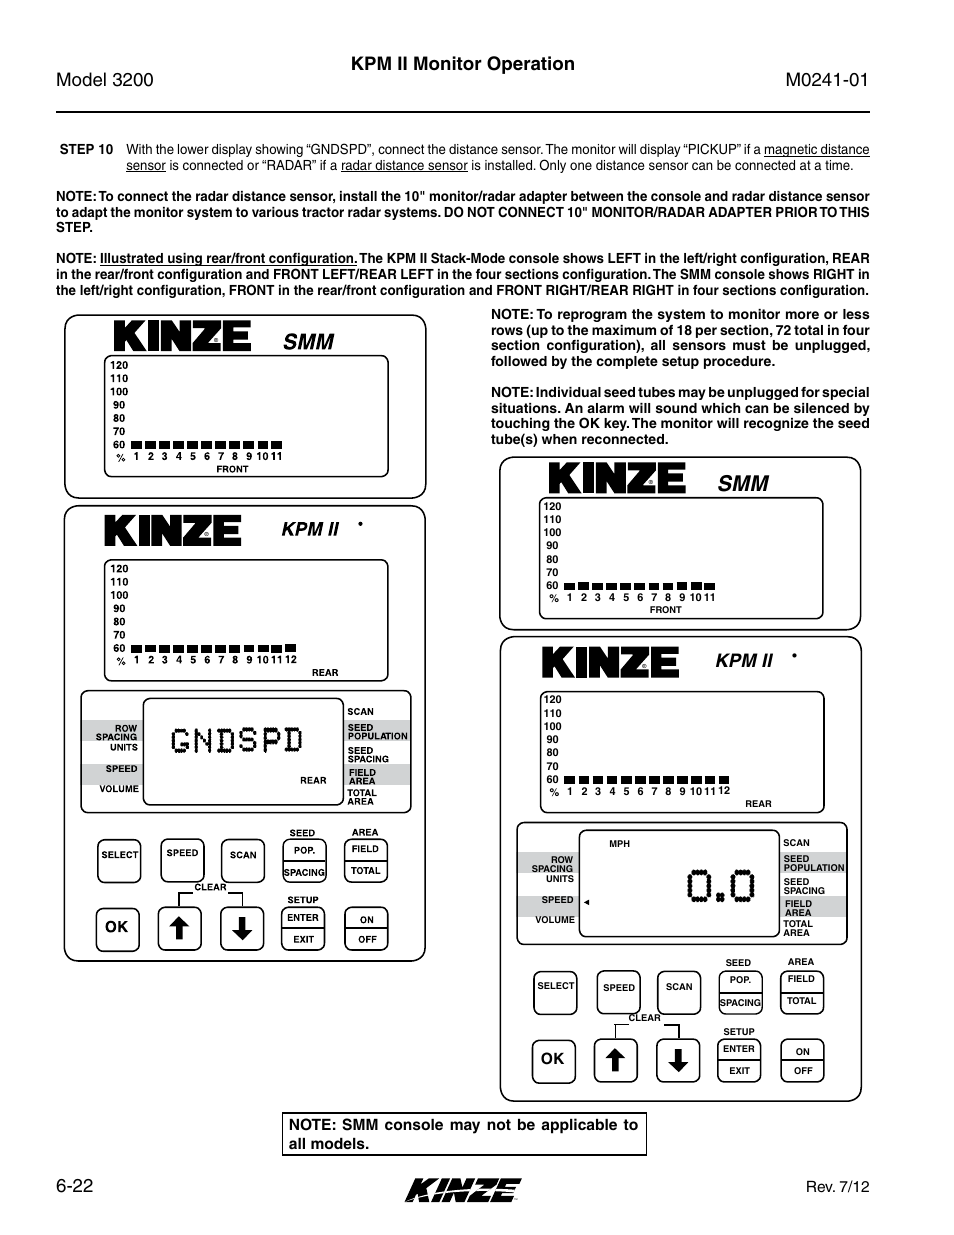 Kpm ii monitor operation, Kpm ii, Rev. 7/12 | Kinze 3200